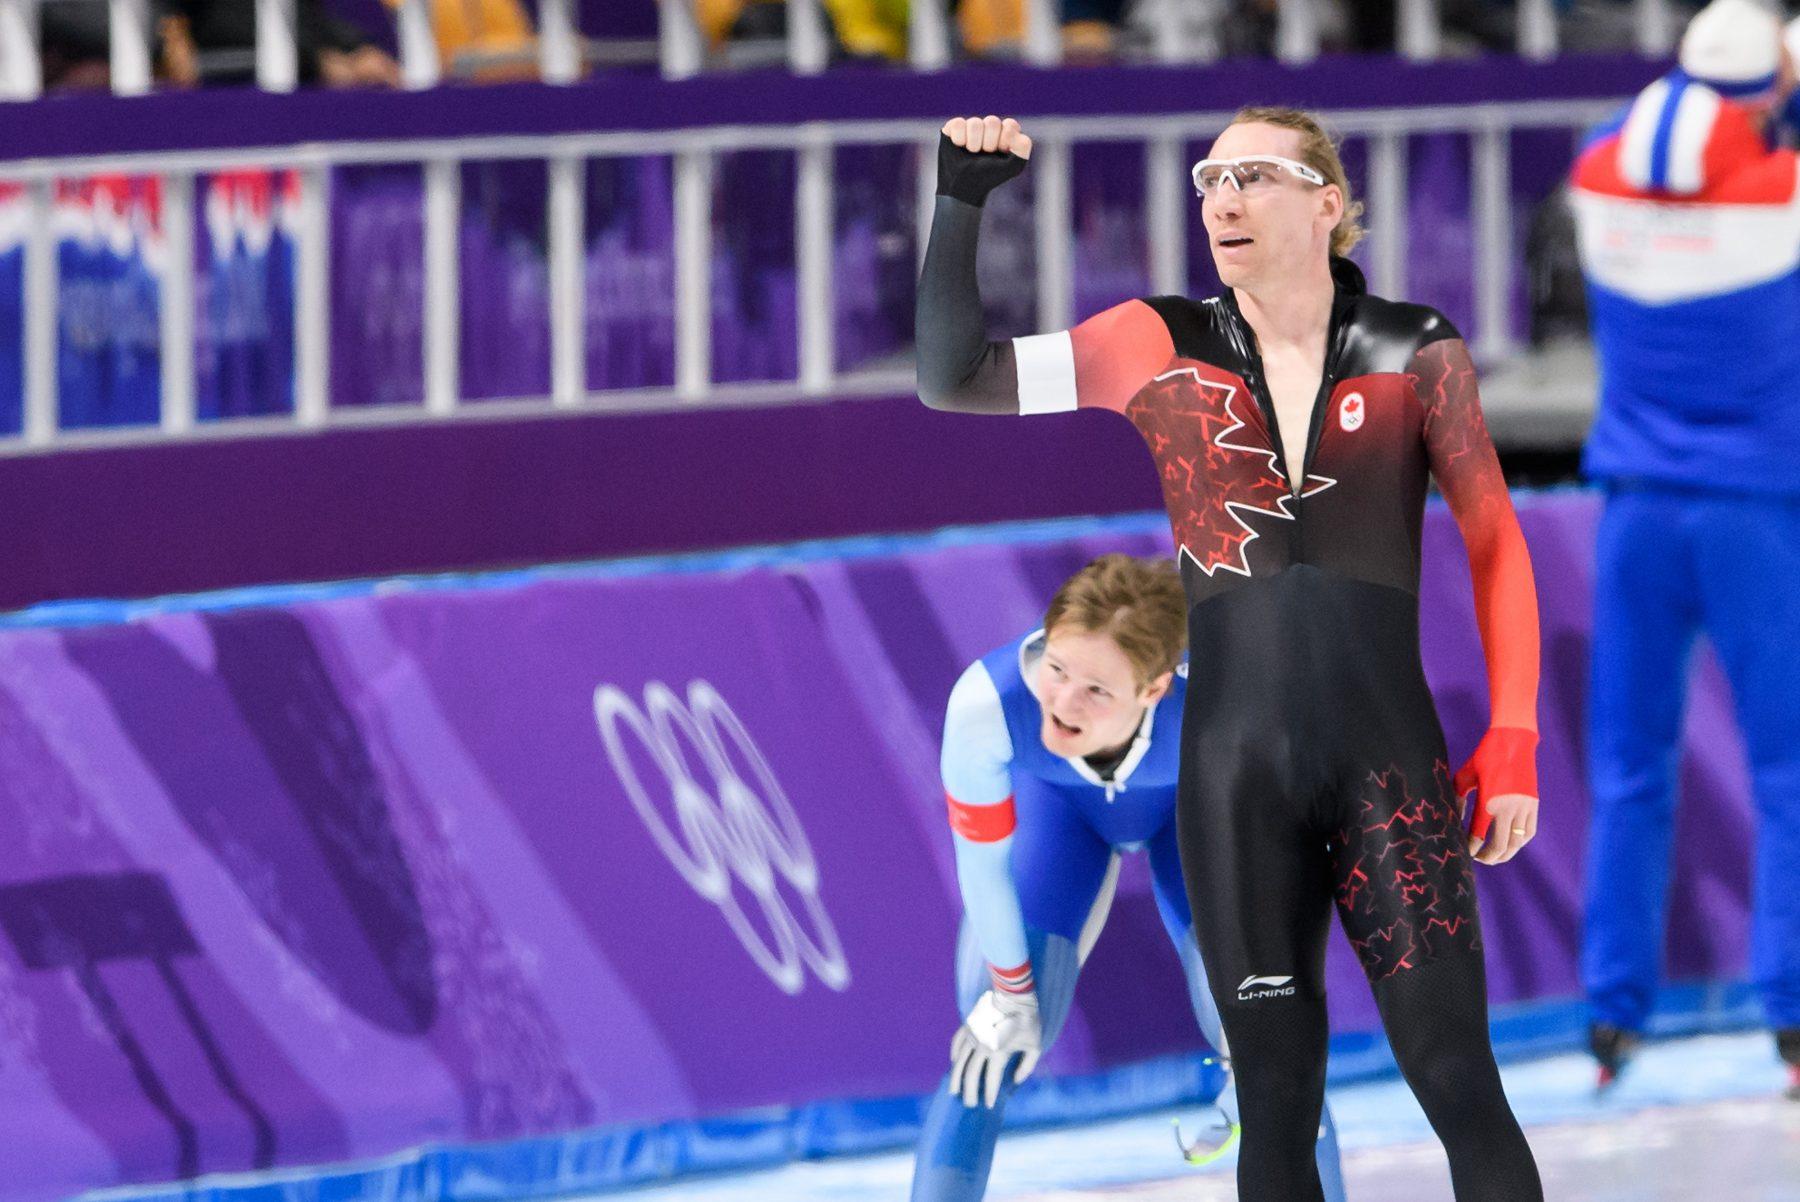 Team Canada Ted-Jan Bloemen PyeongChang 2018 5000m